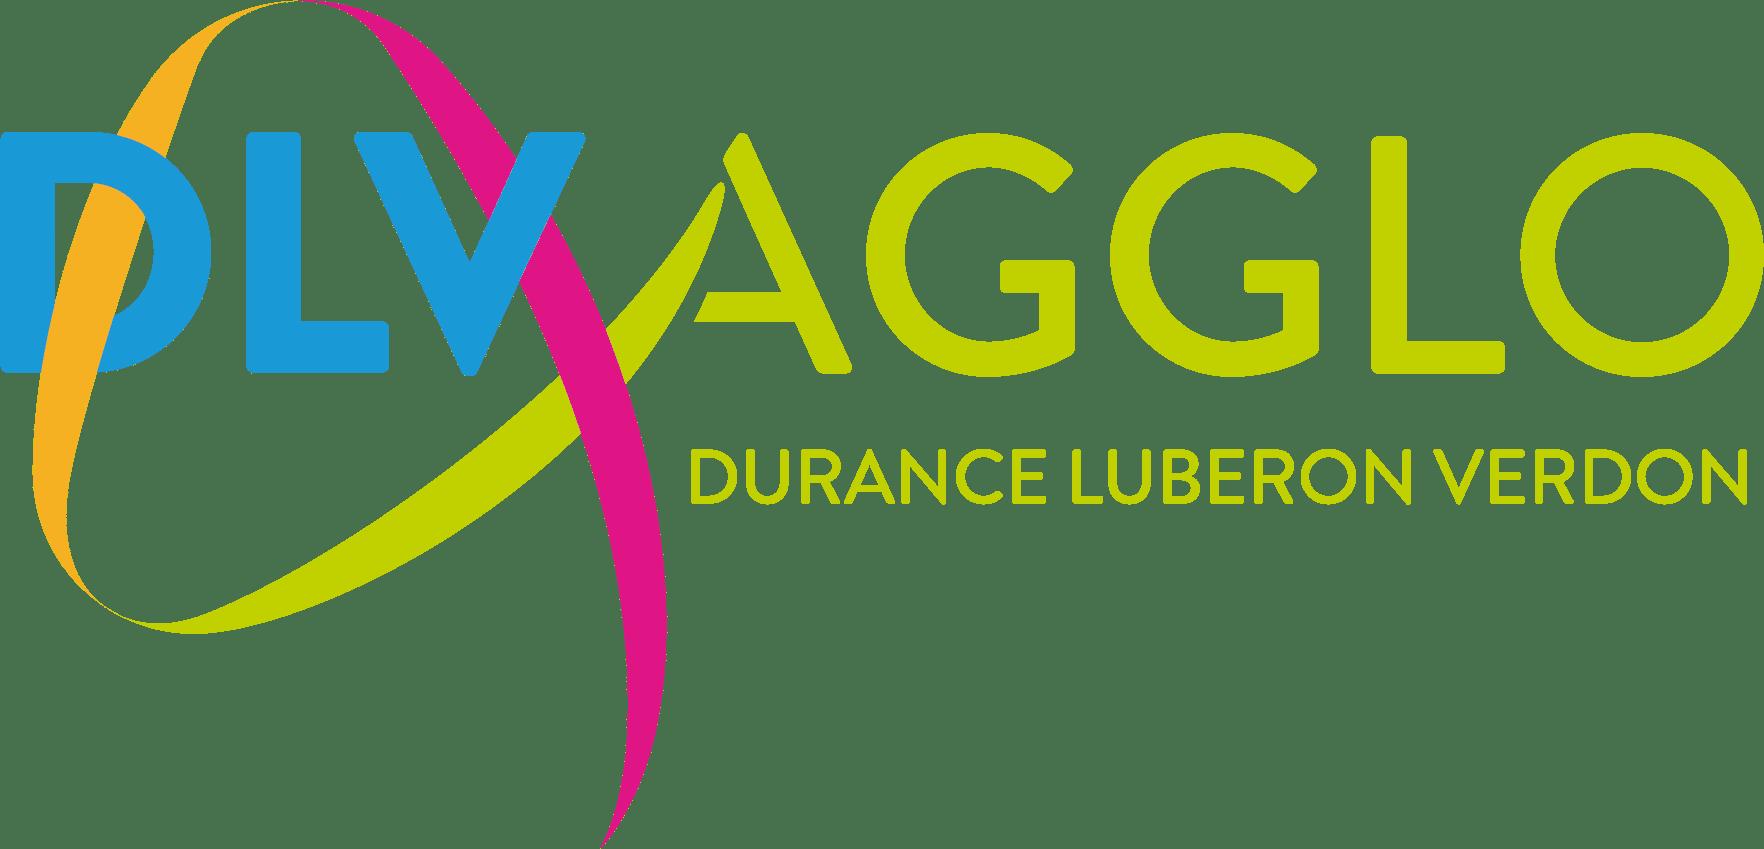 DLVA Durance Luberon Verdon Agglomération